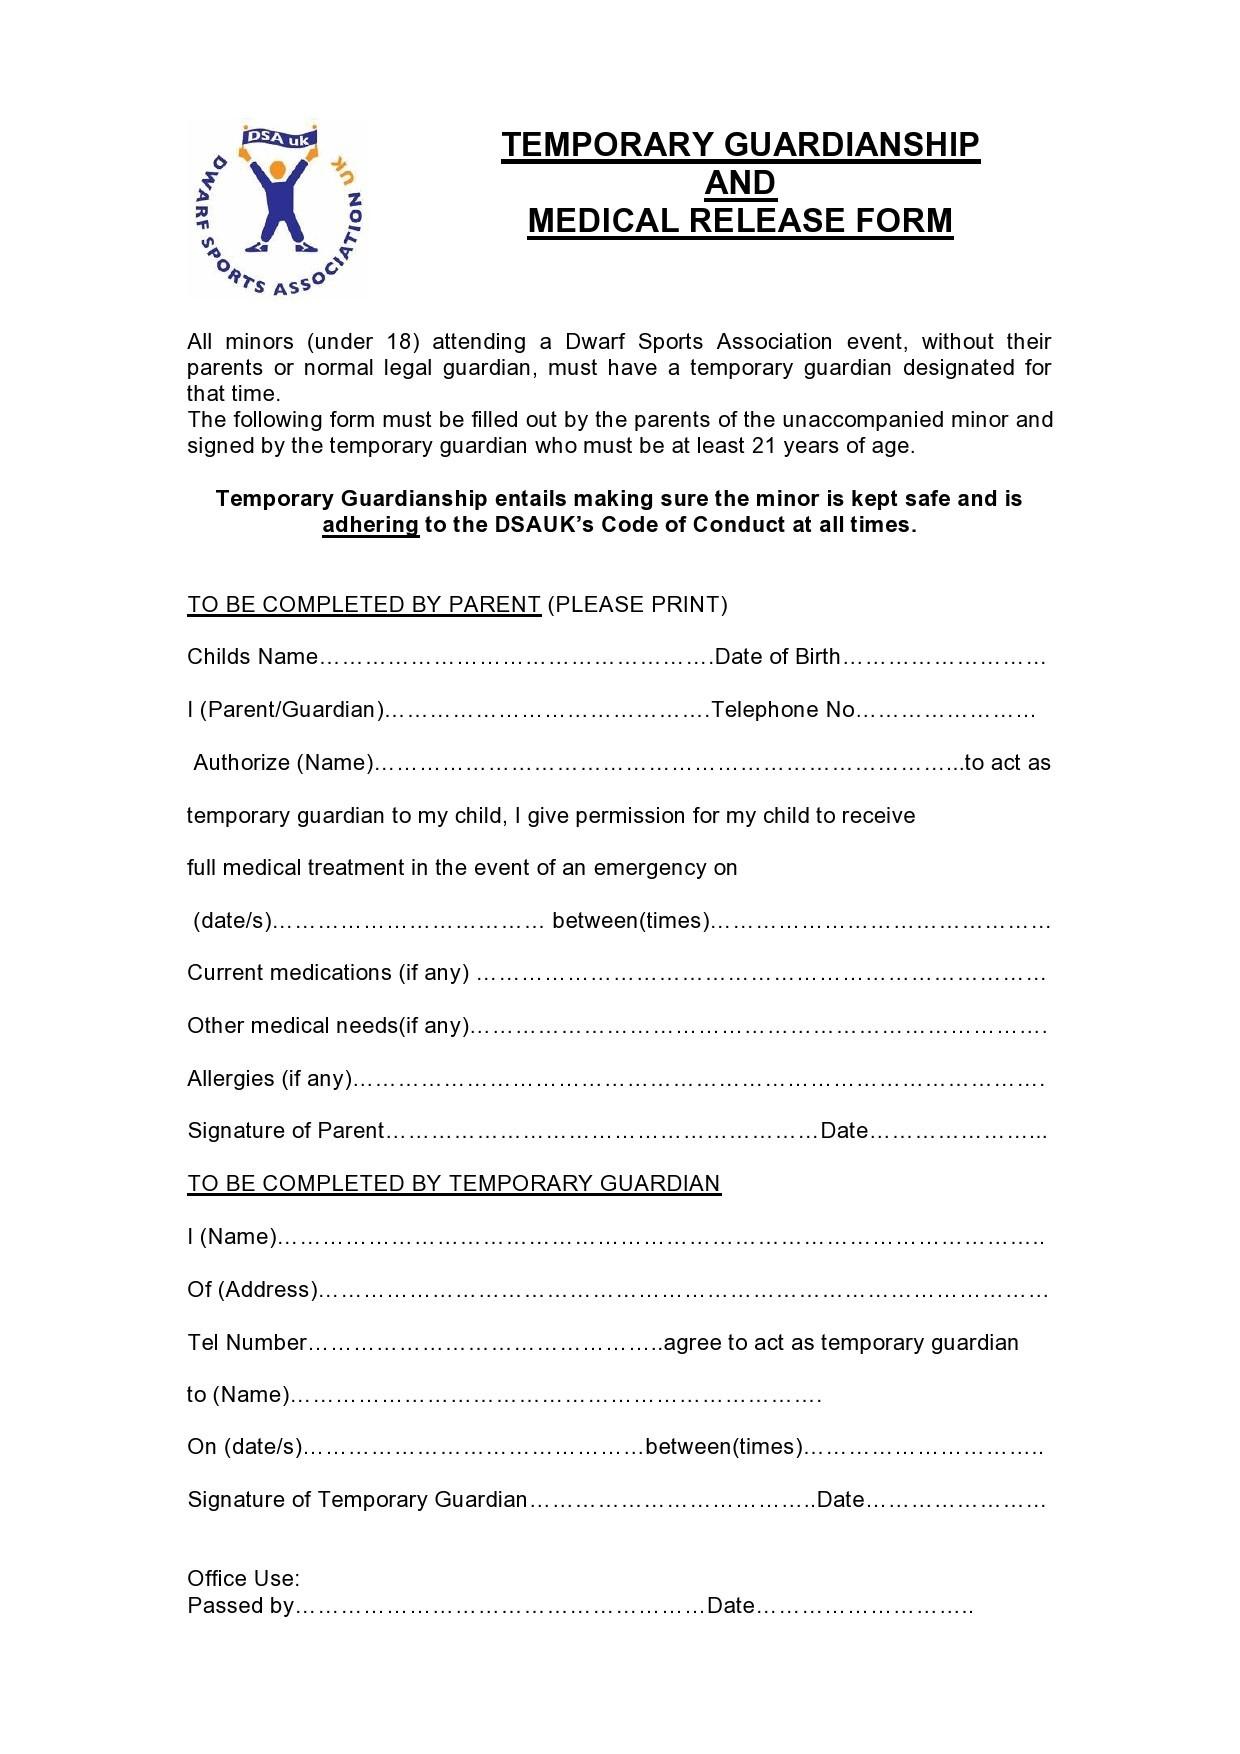 Free guardianship form 19